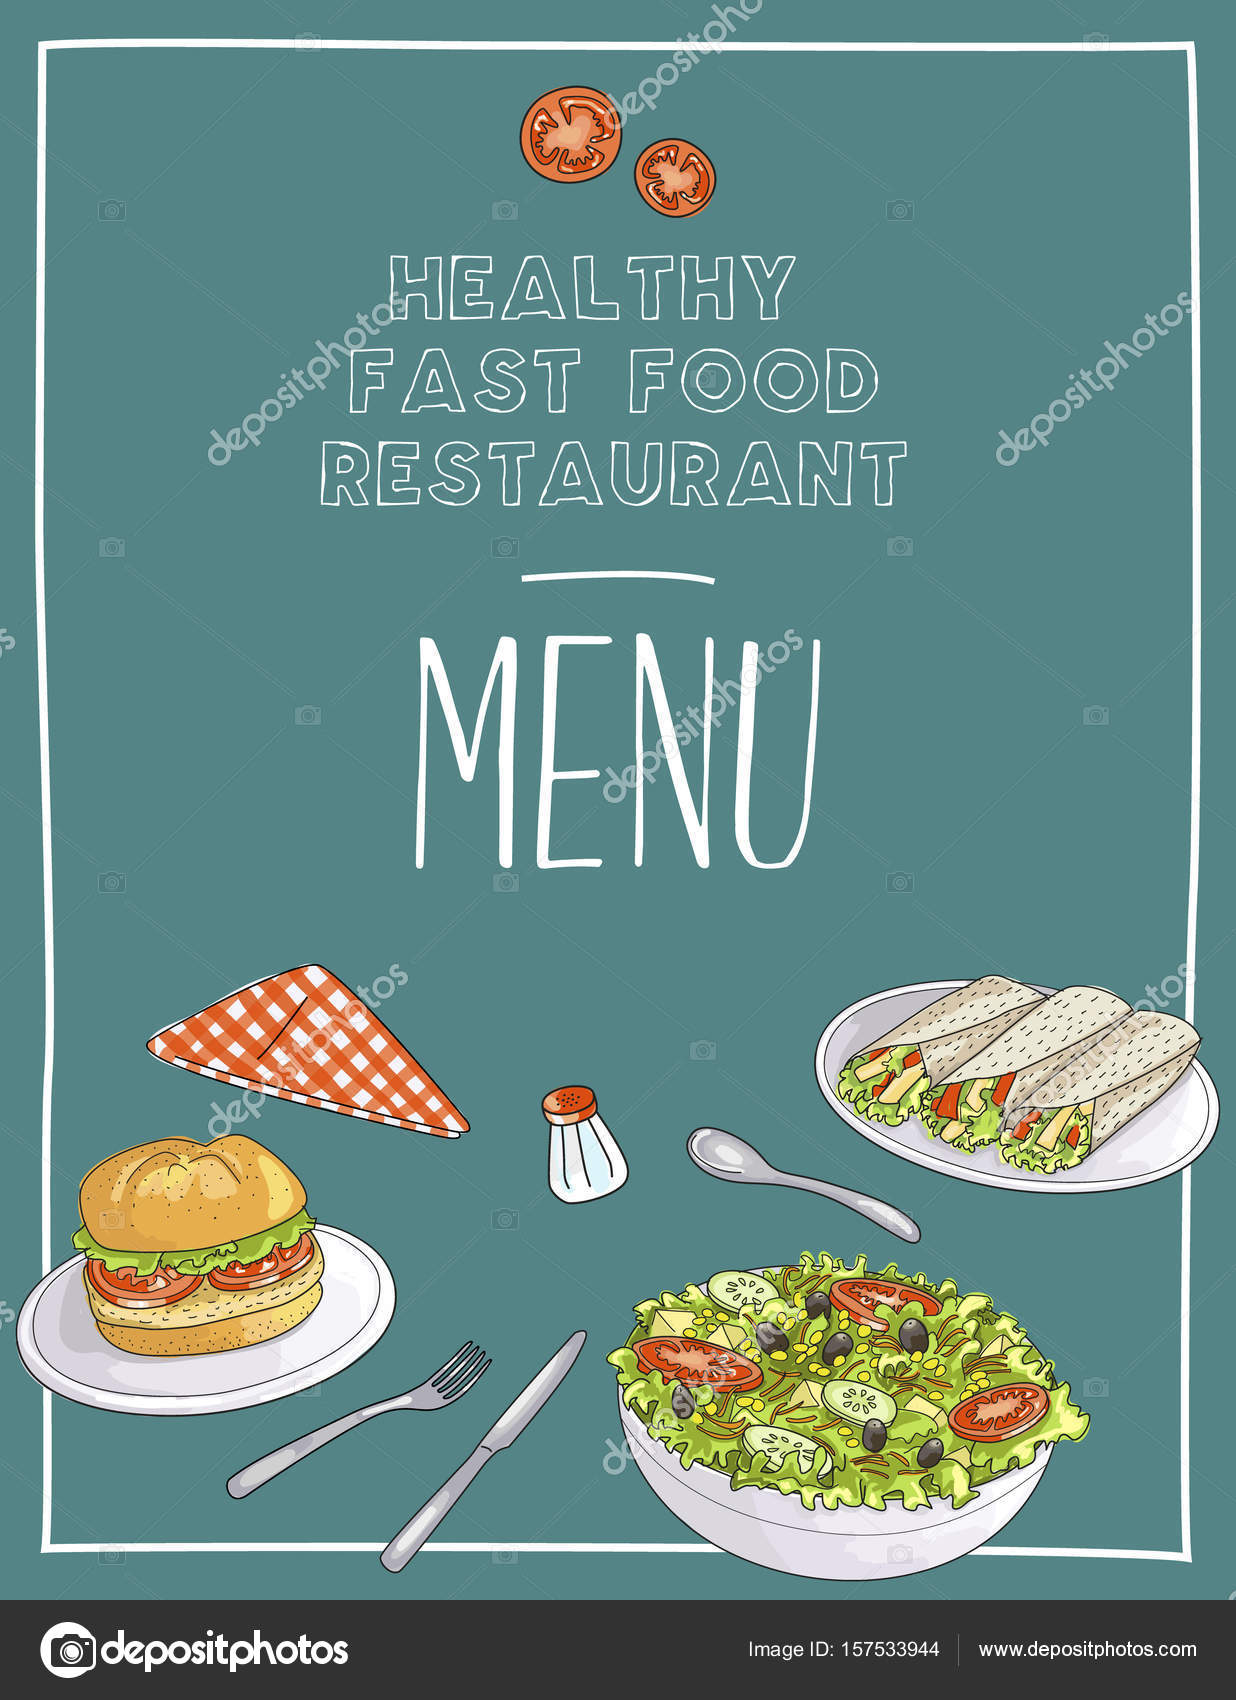 Gesundes Fast Food Restaurant Menüvorlage Vektor — Stockvektor ...